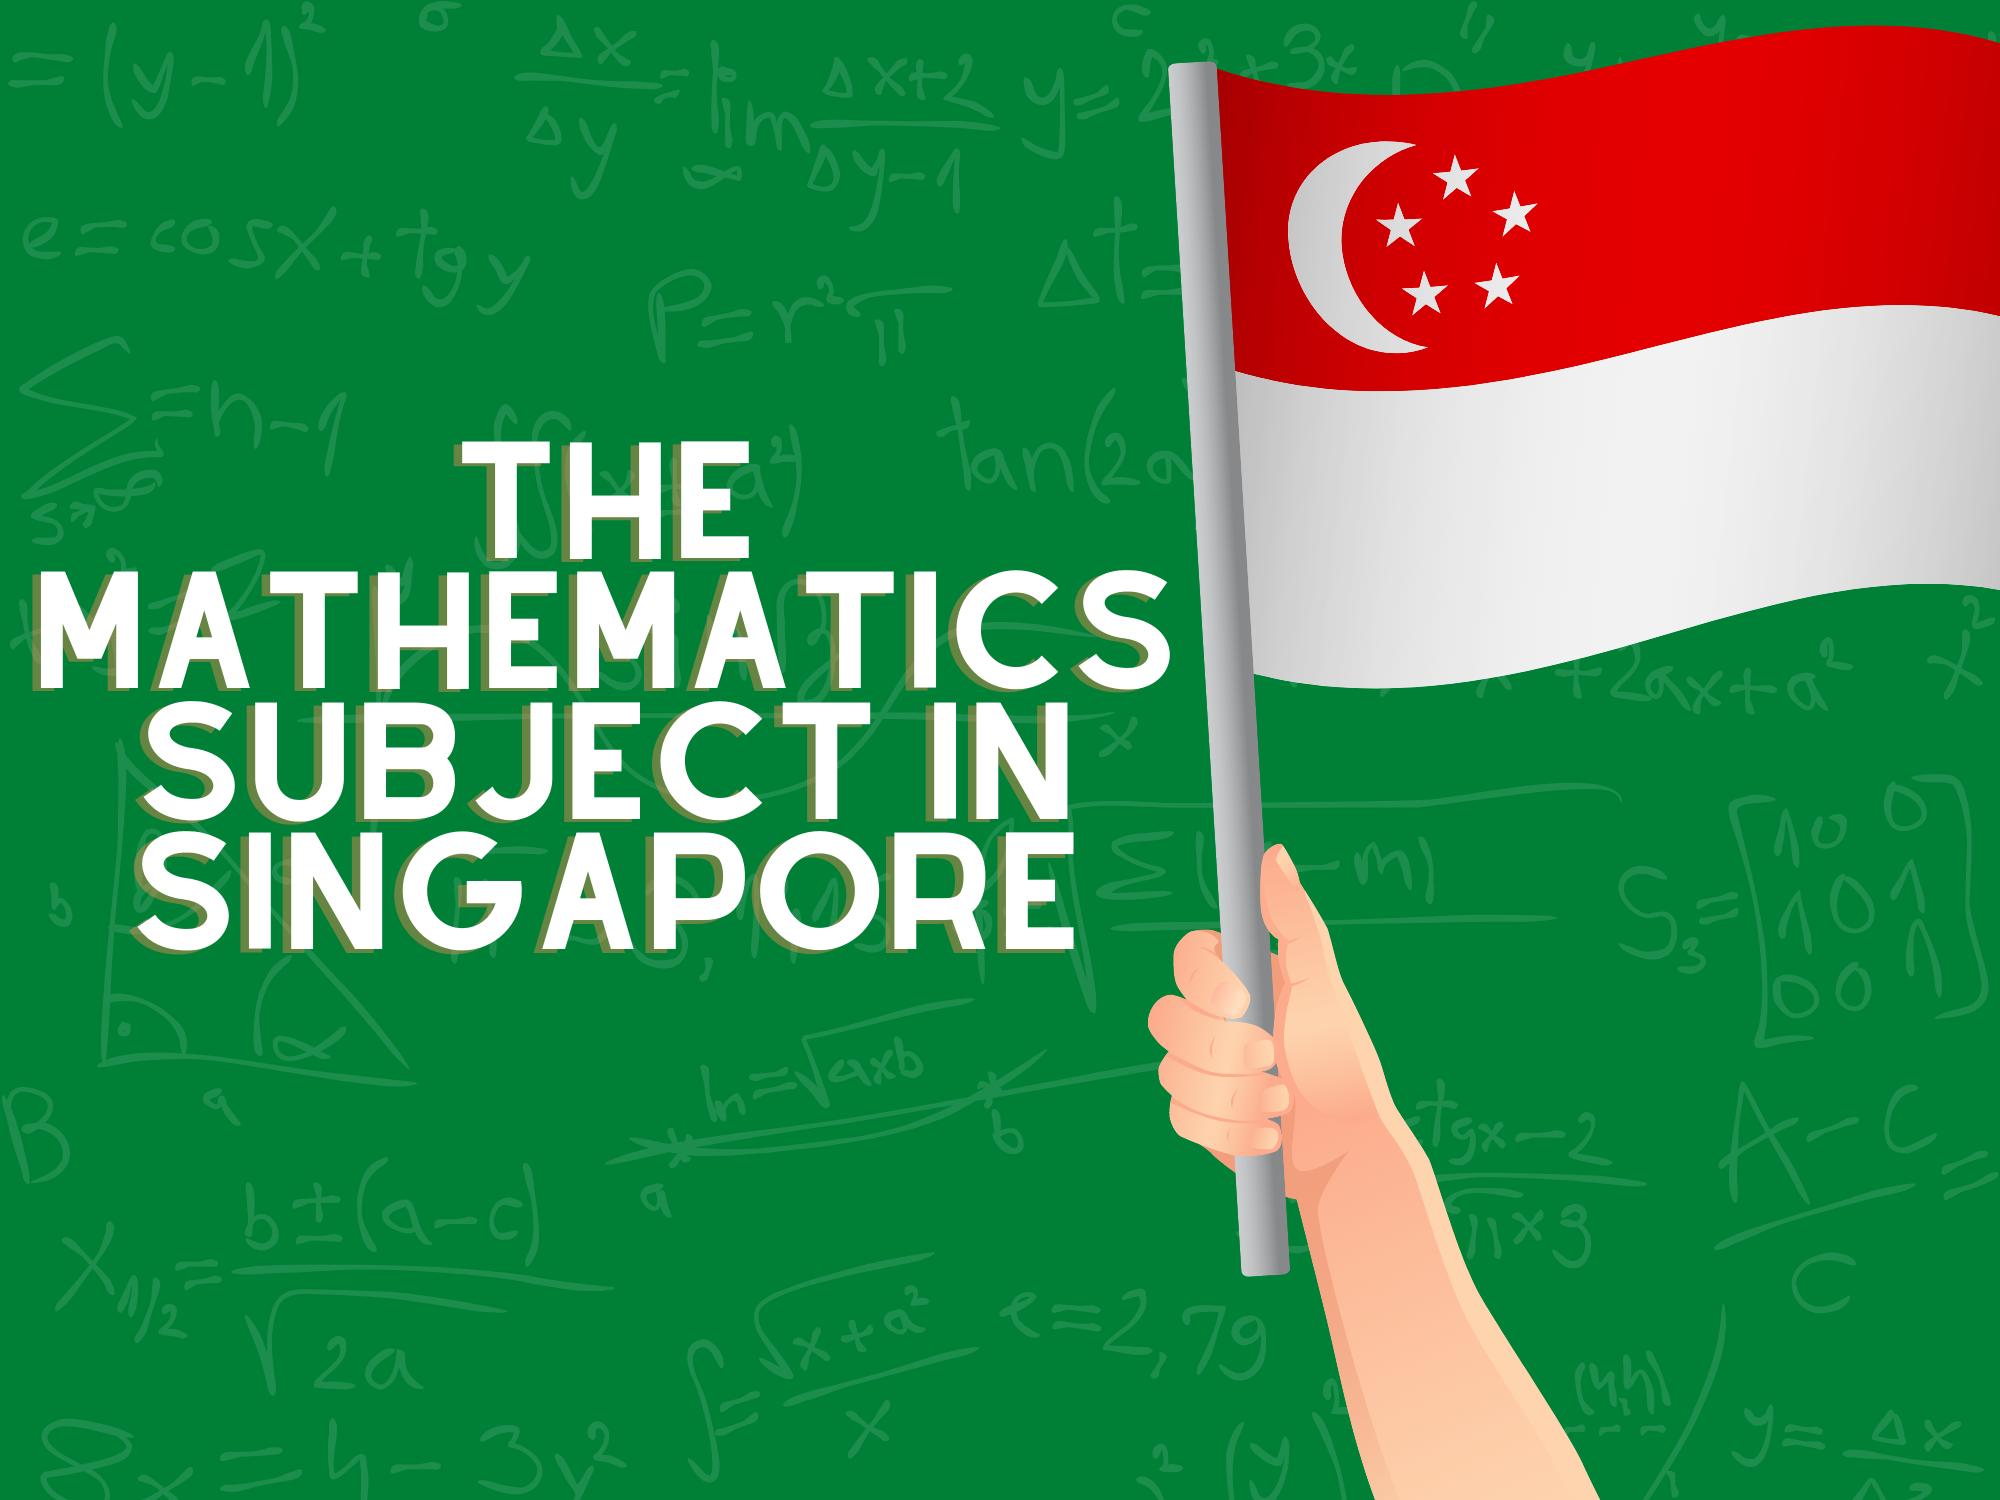 The-Mathematics-Subject-in-Singapore